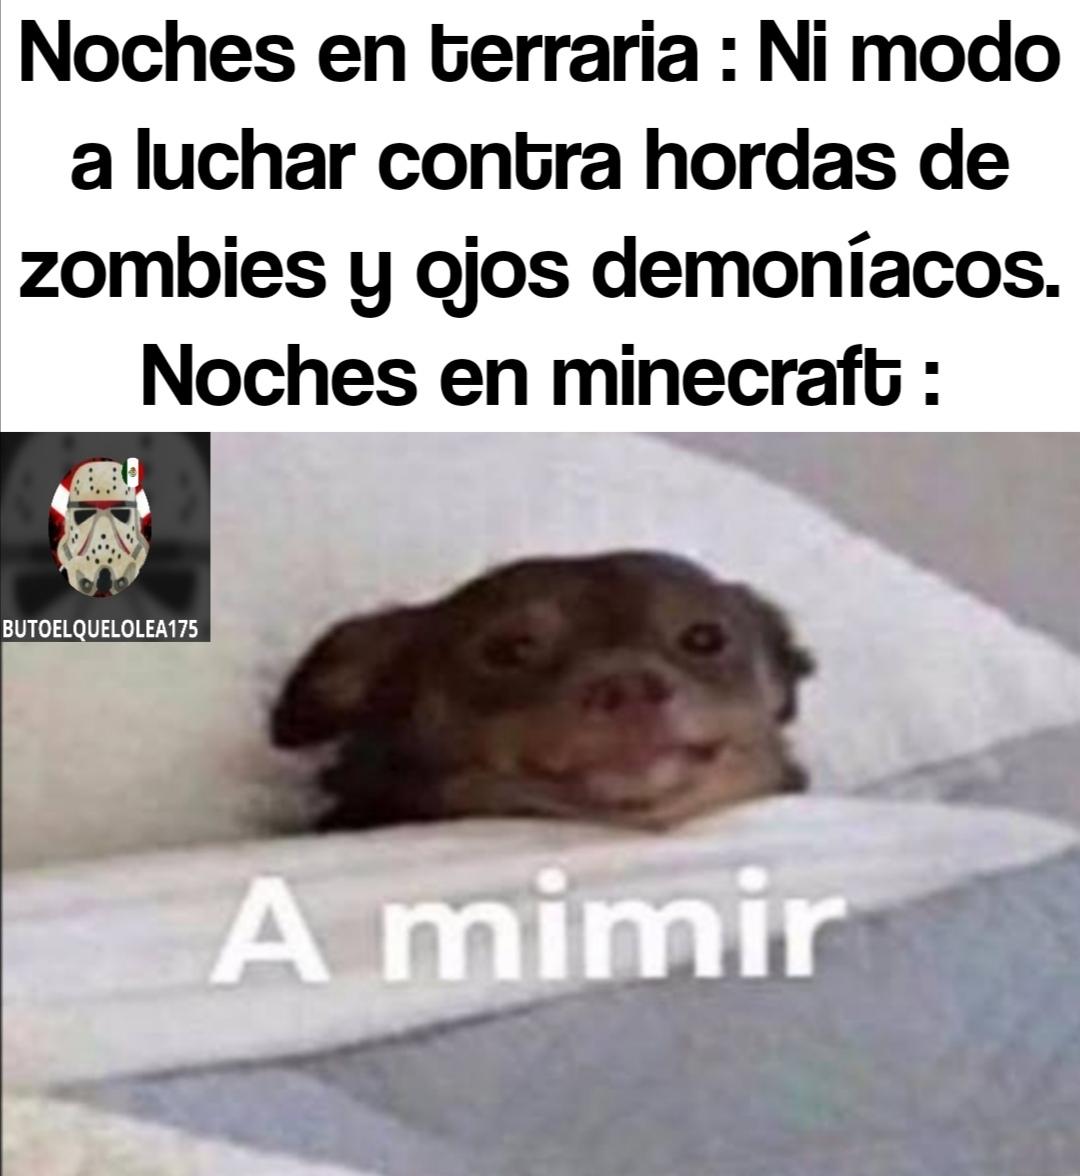 A mimir porque spawnean zombies, creepers y esqueletos - meme